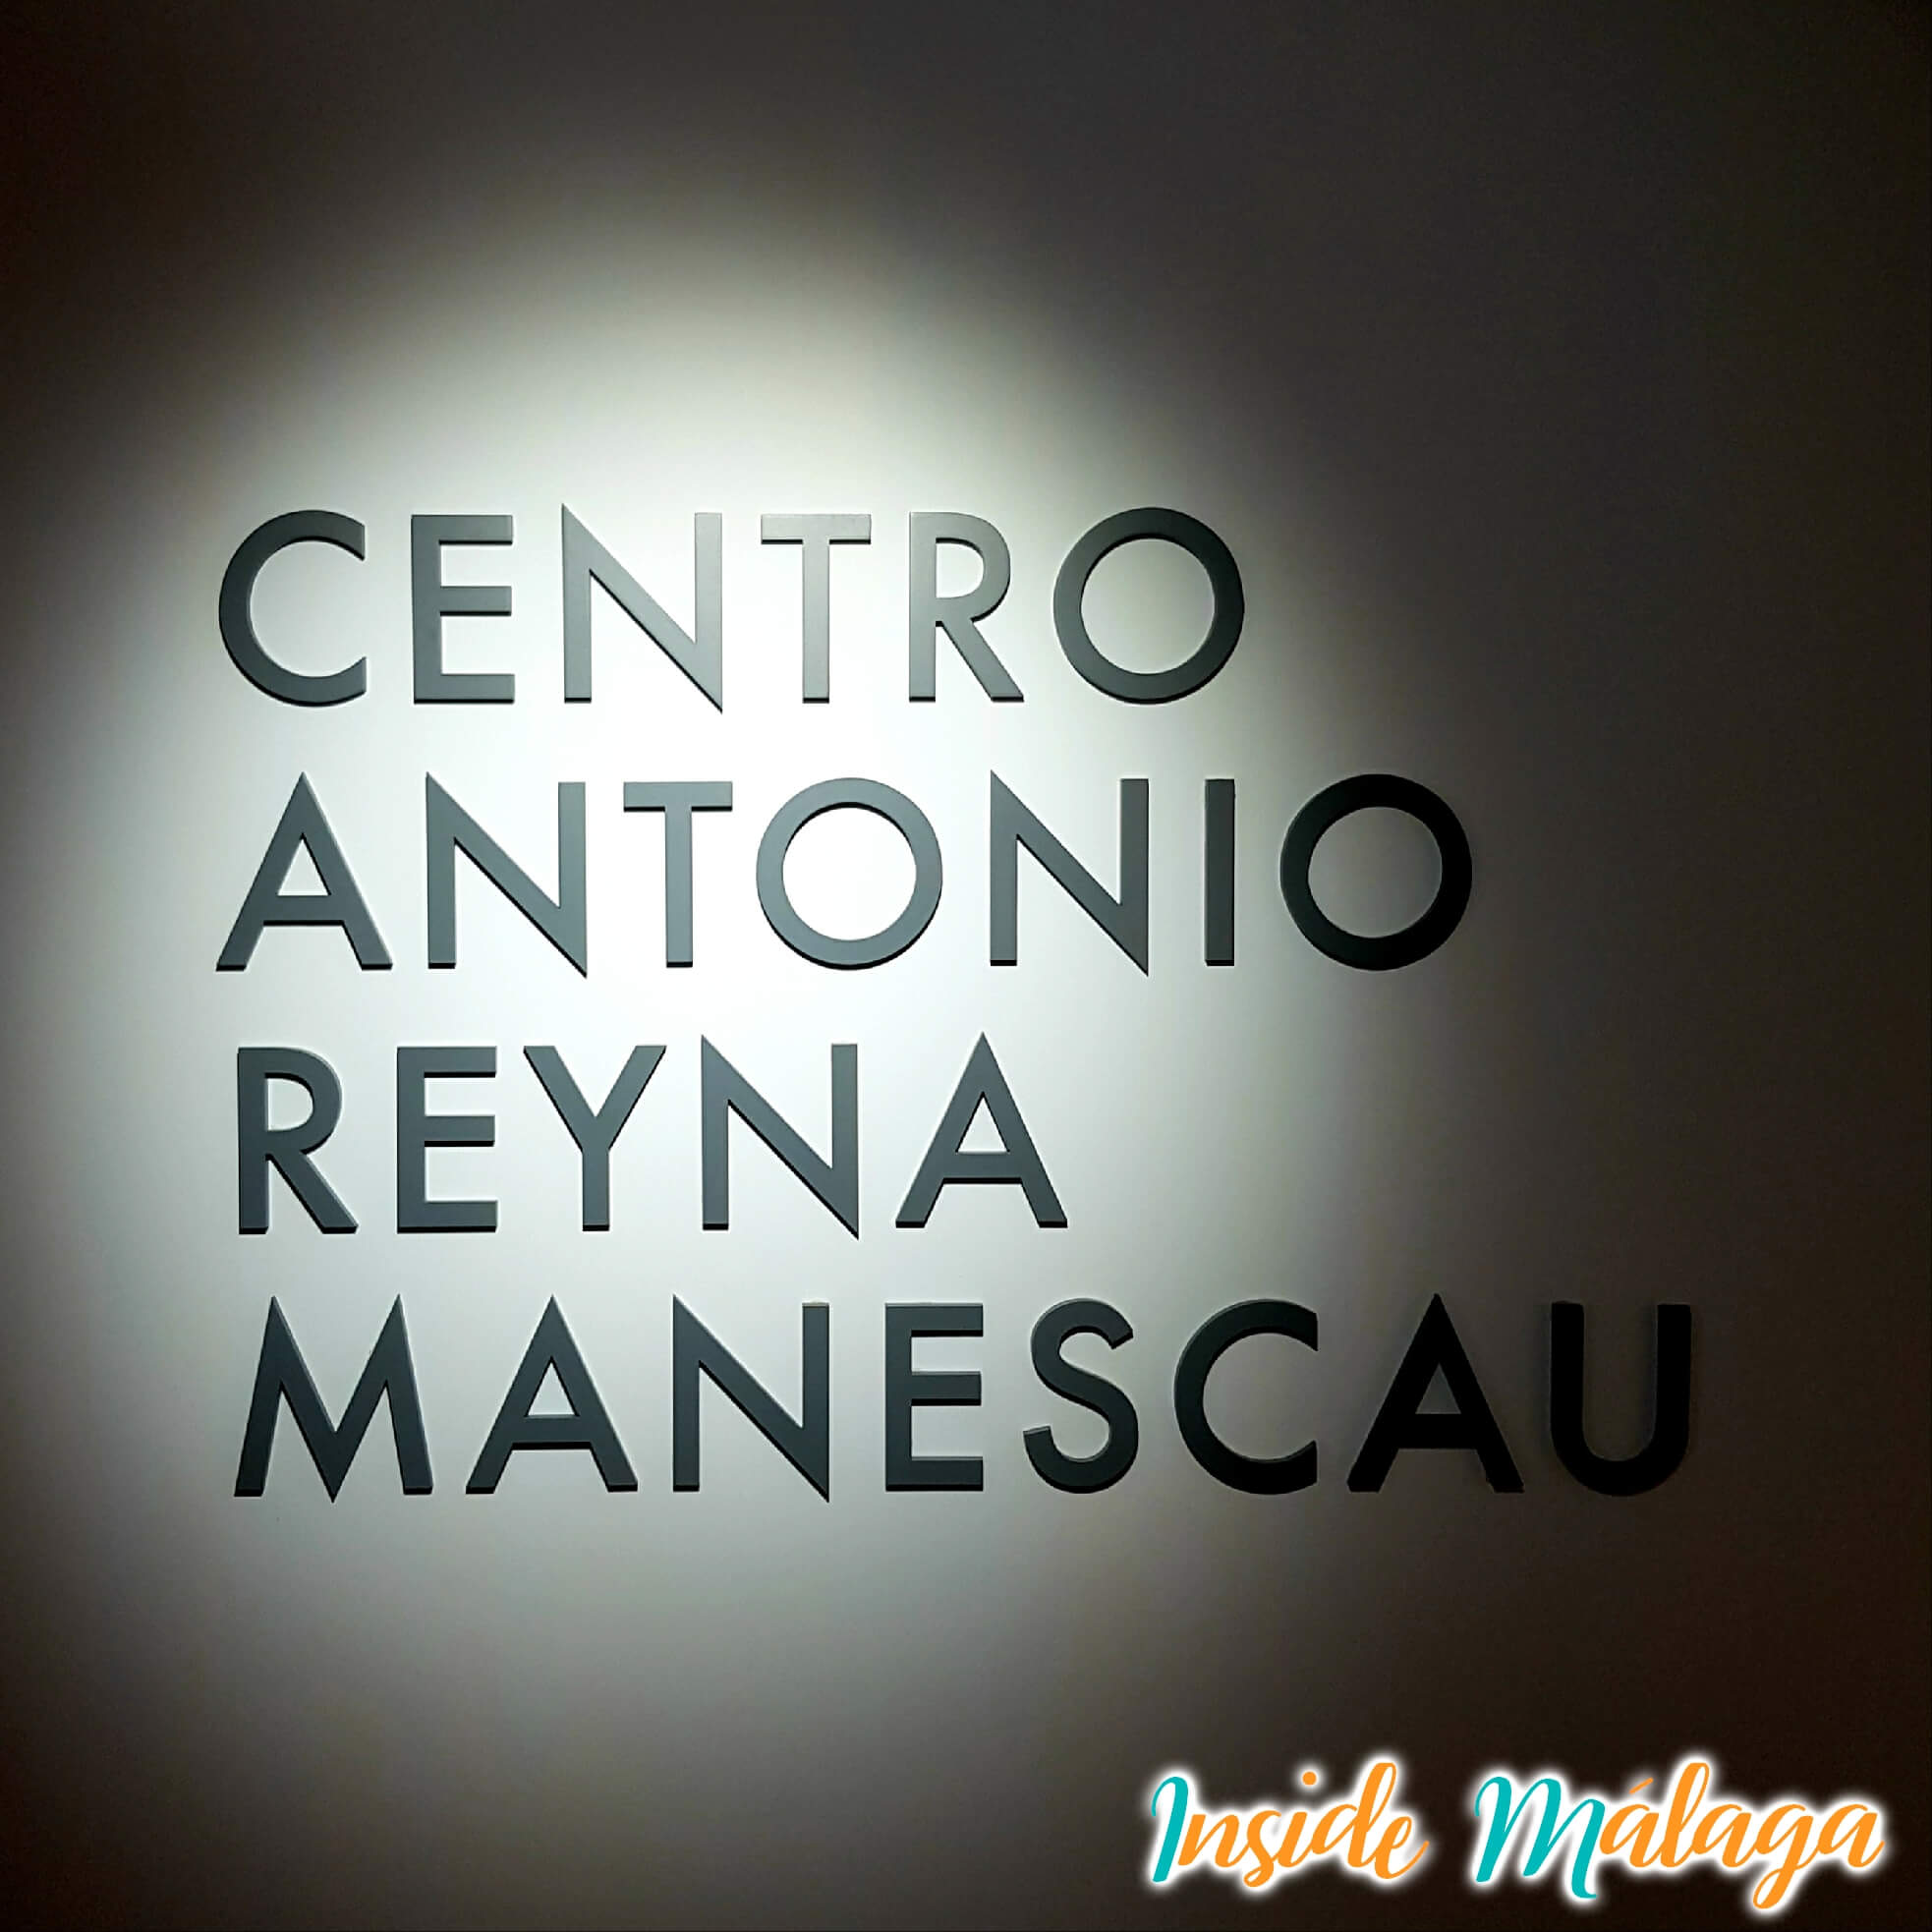 Centro Antonio Reyna Manescau Coin Malaga